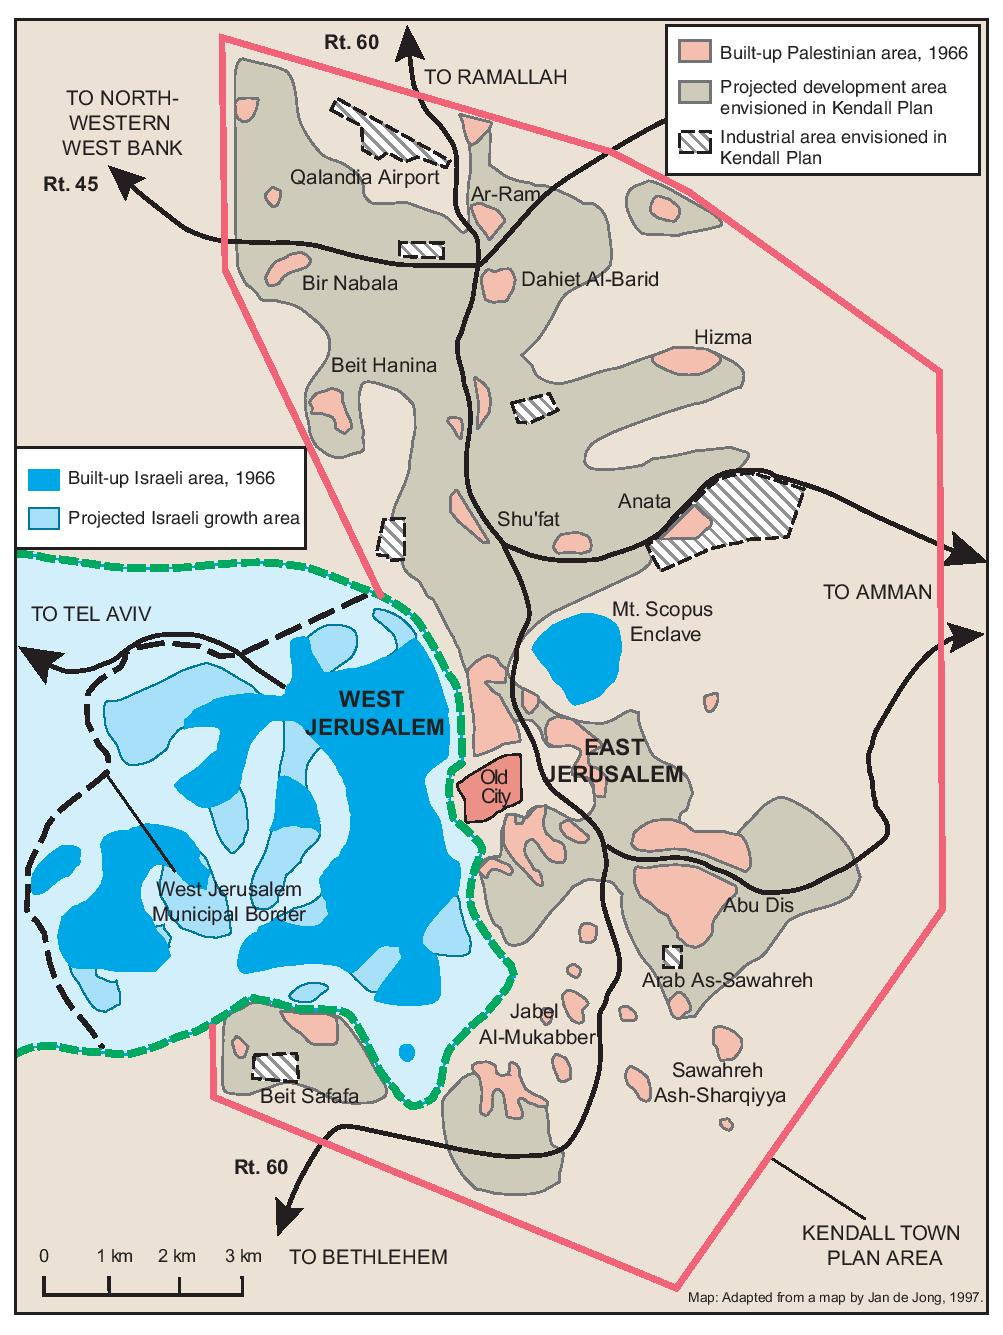 PIA - MAPS - Jerusalem - THE KENDALL TOWN SCHEME, 1966 Scheme Map on